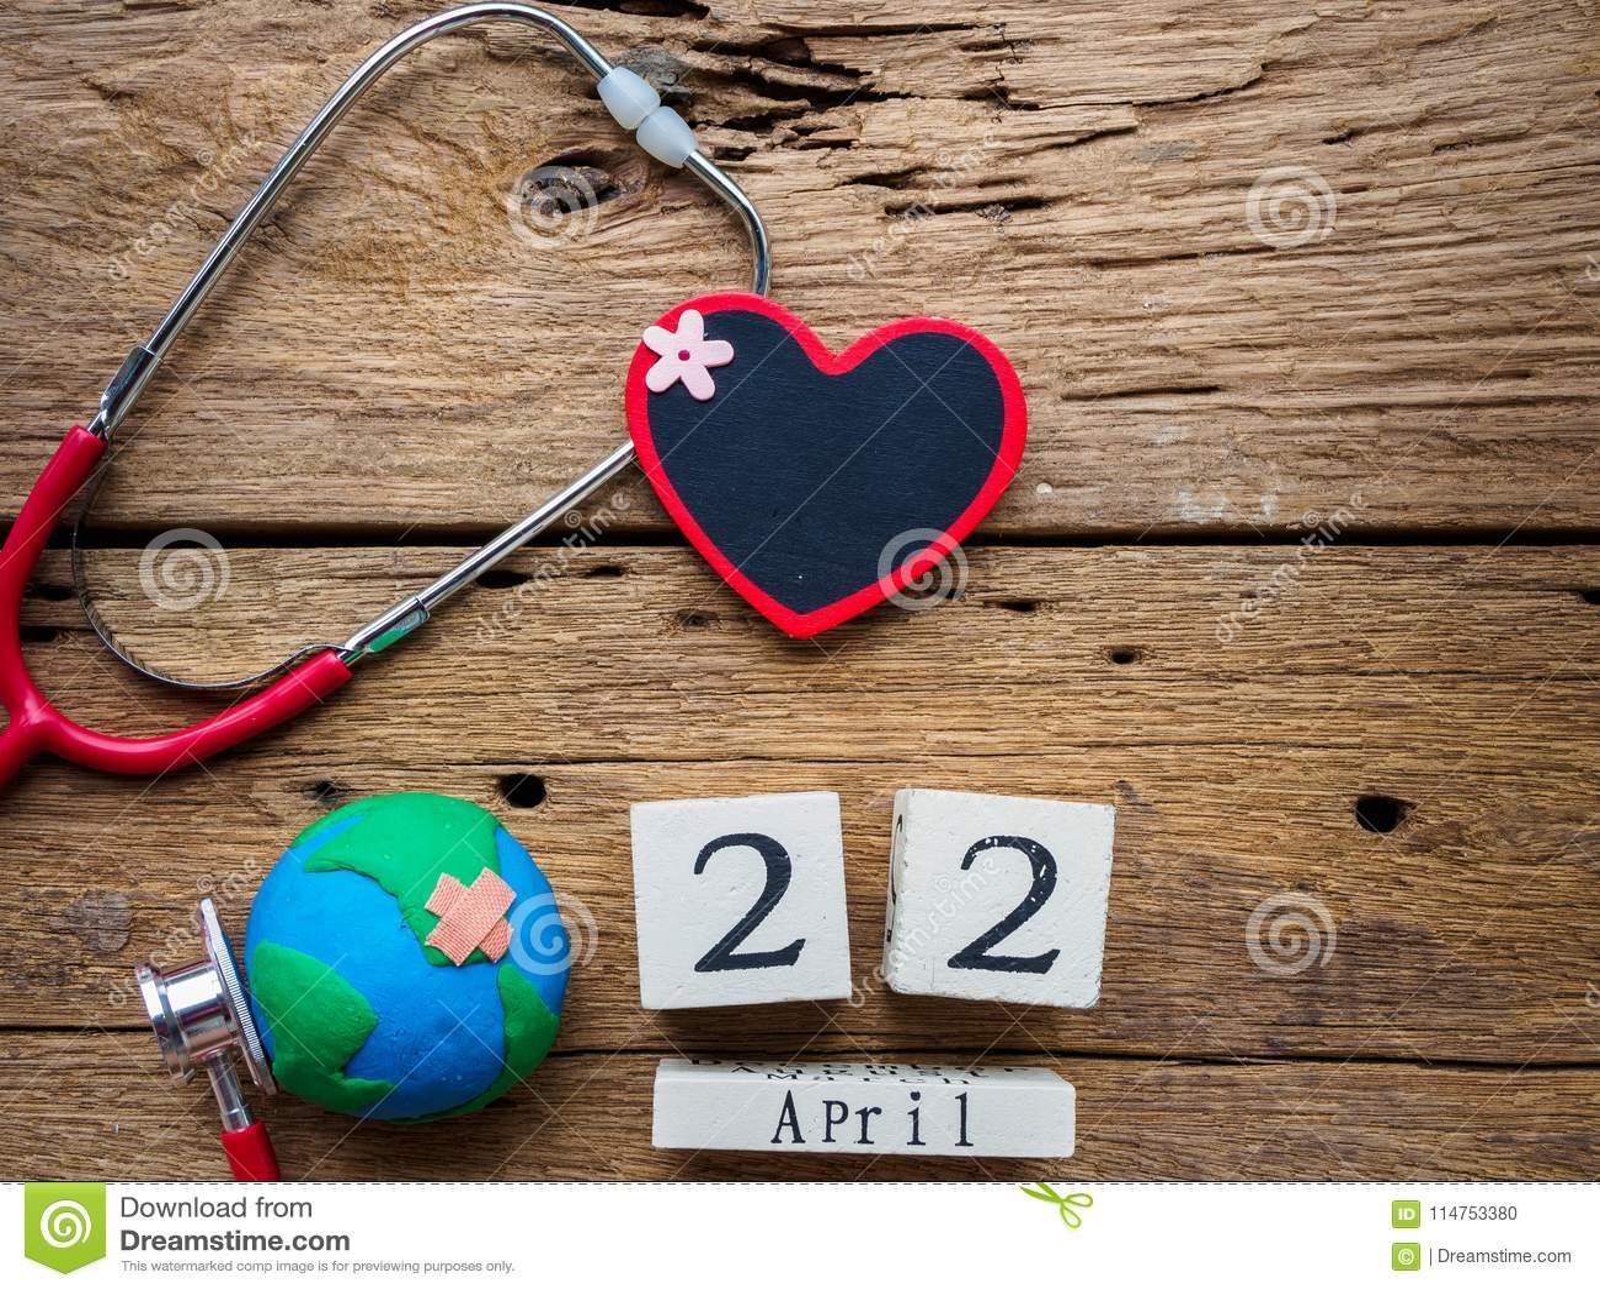 Wooden Block calendar for World Earth Day April 22, Stethoscope